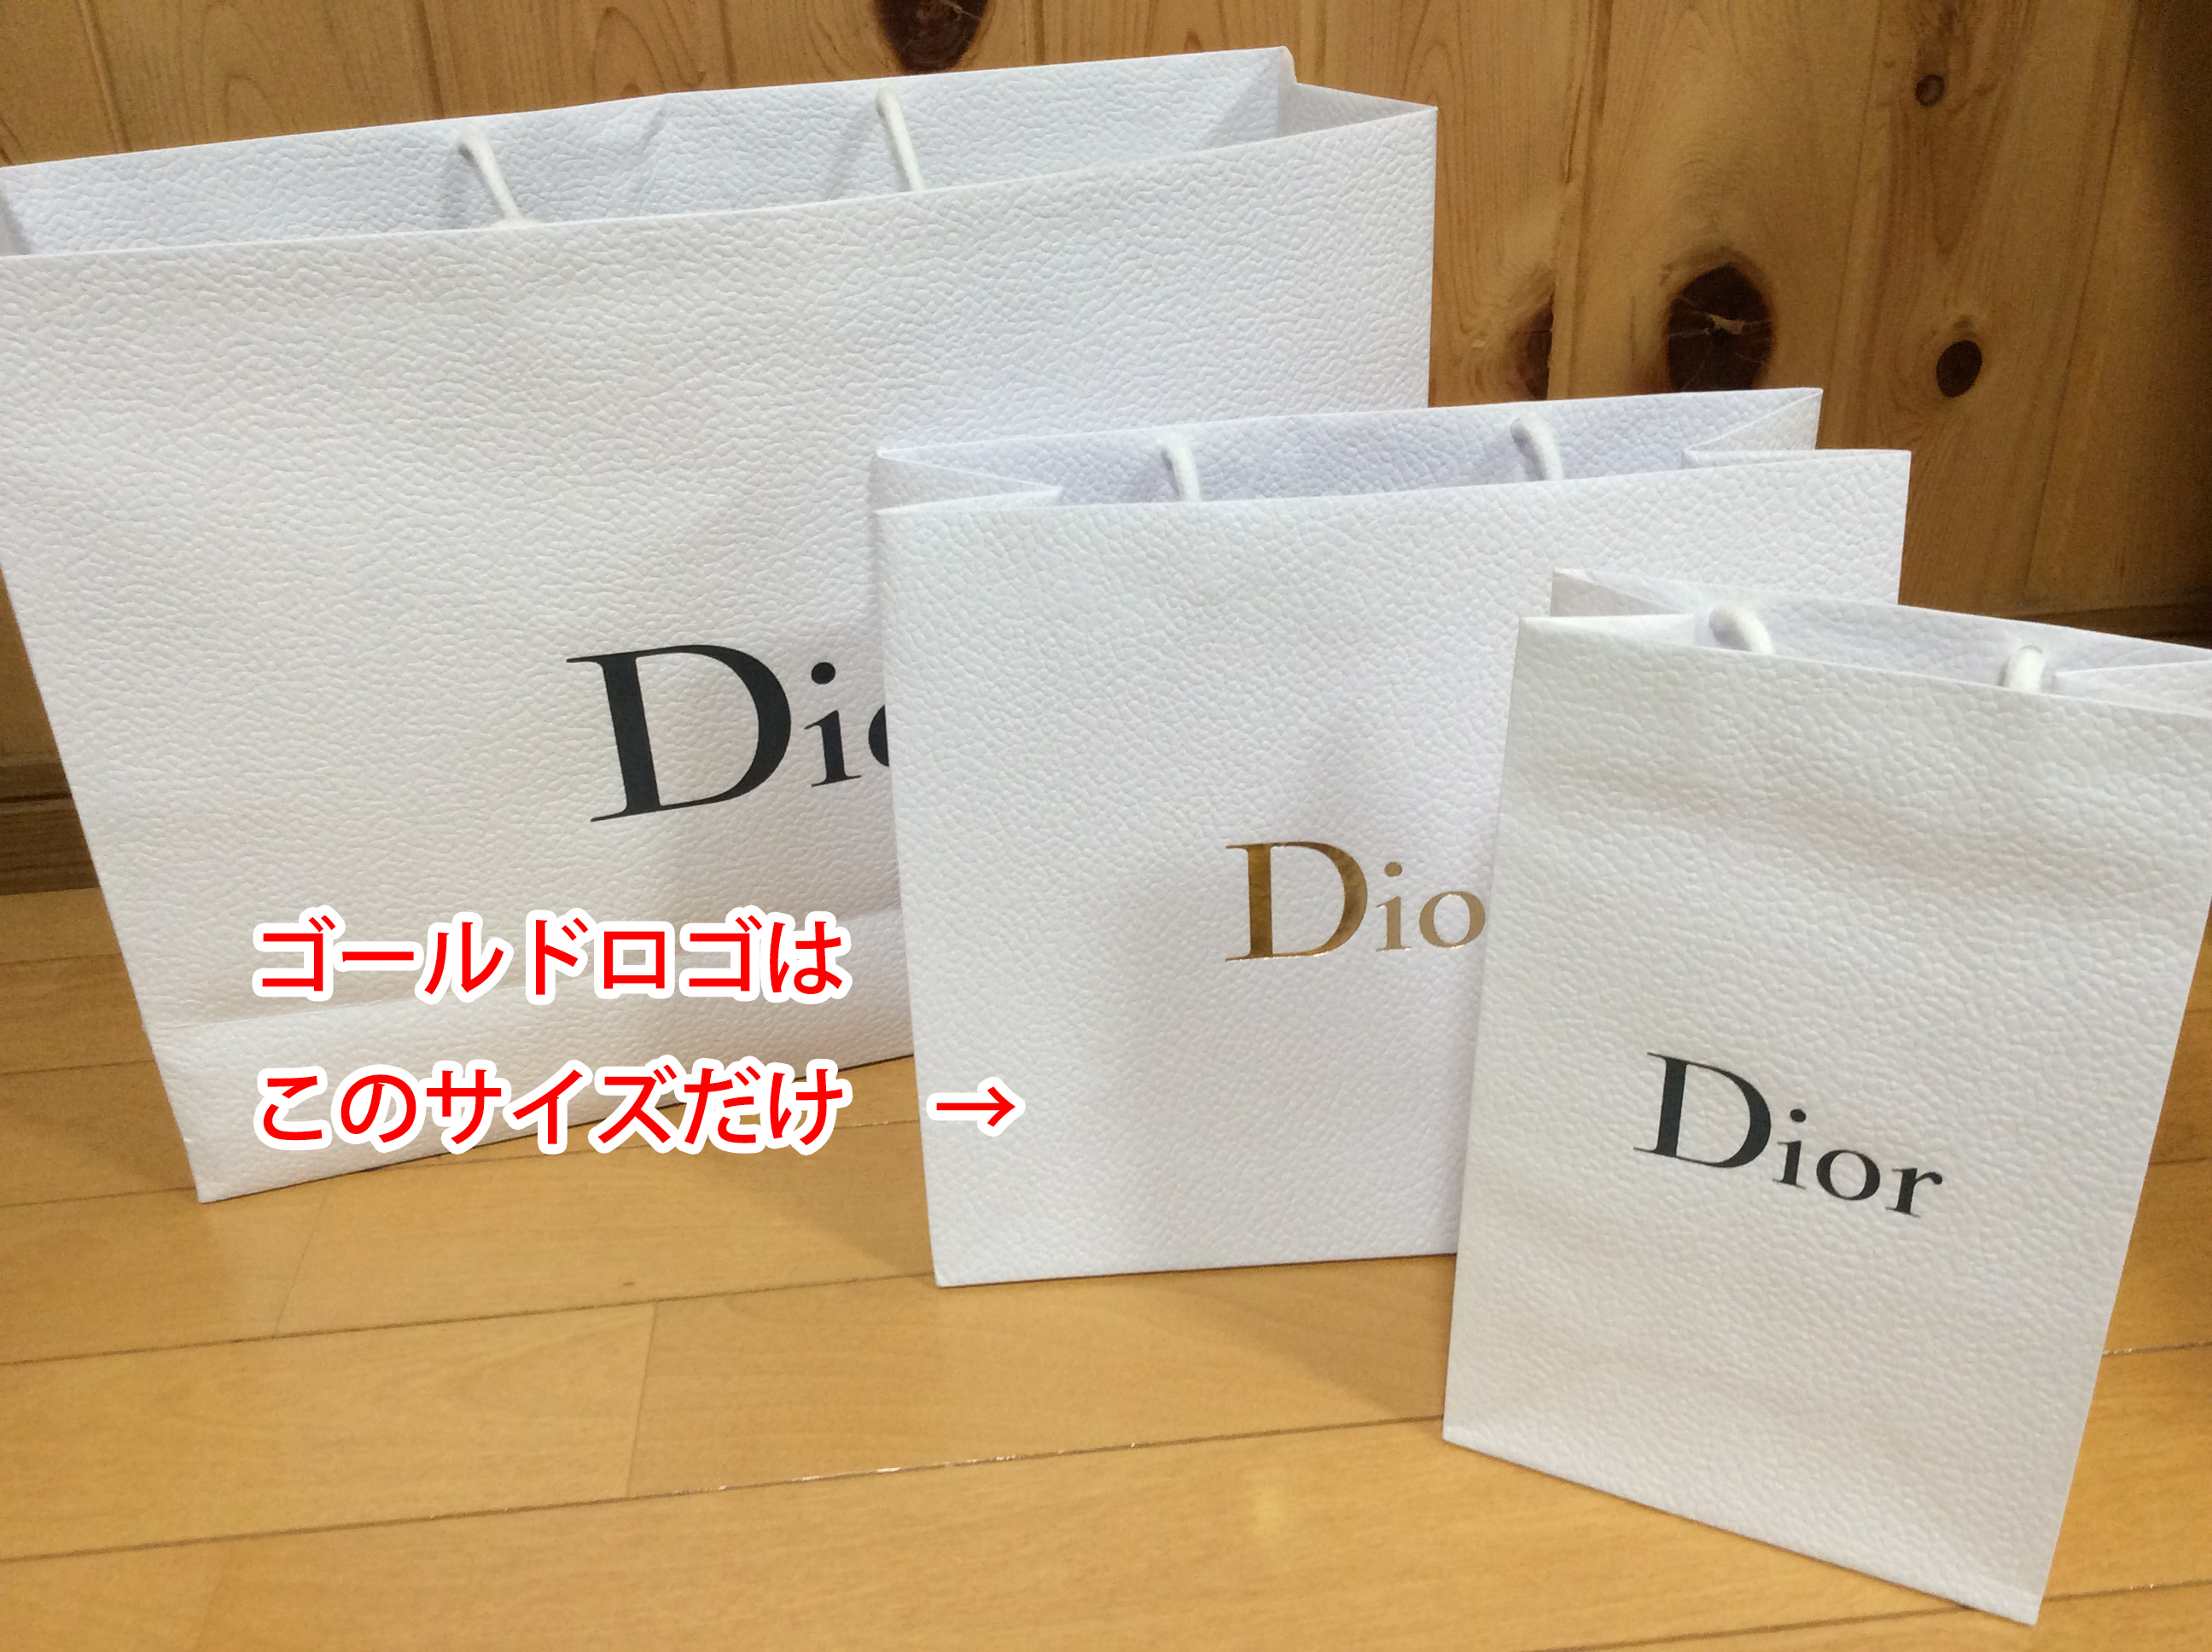 Dior ディオール クリスマスバージョンのショッパーはロゴが金の箔押し 2018